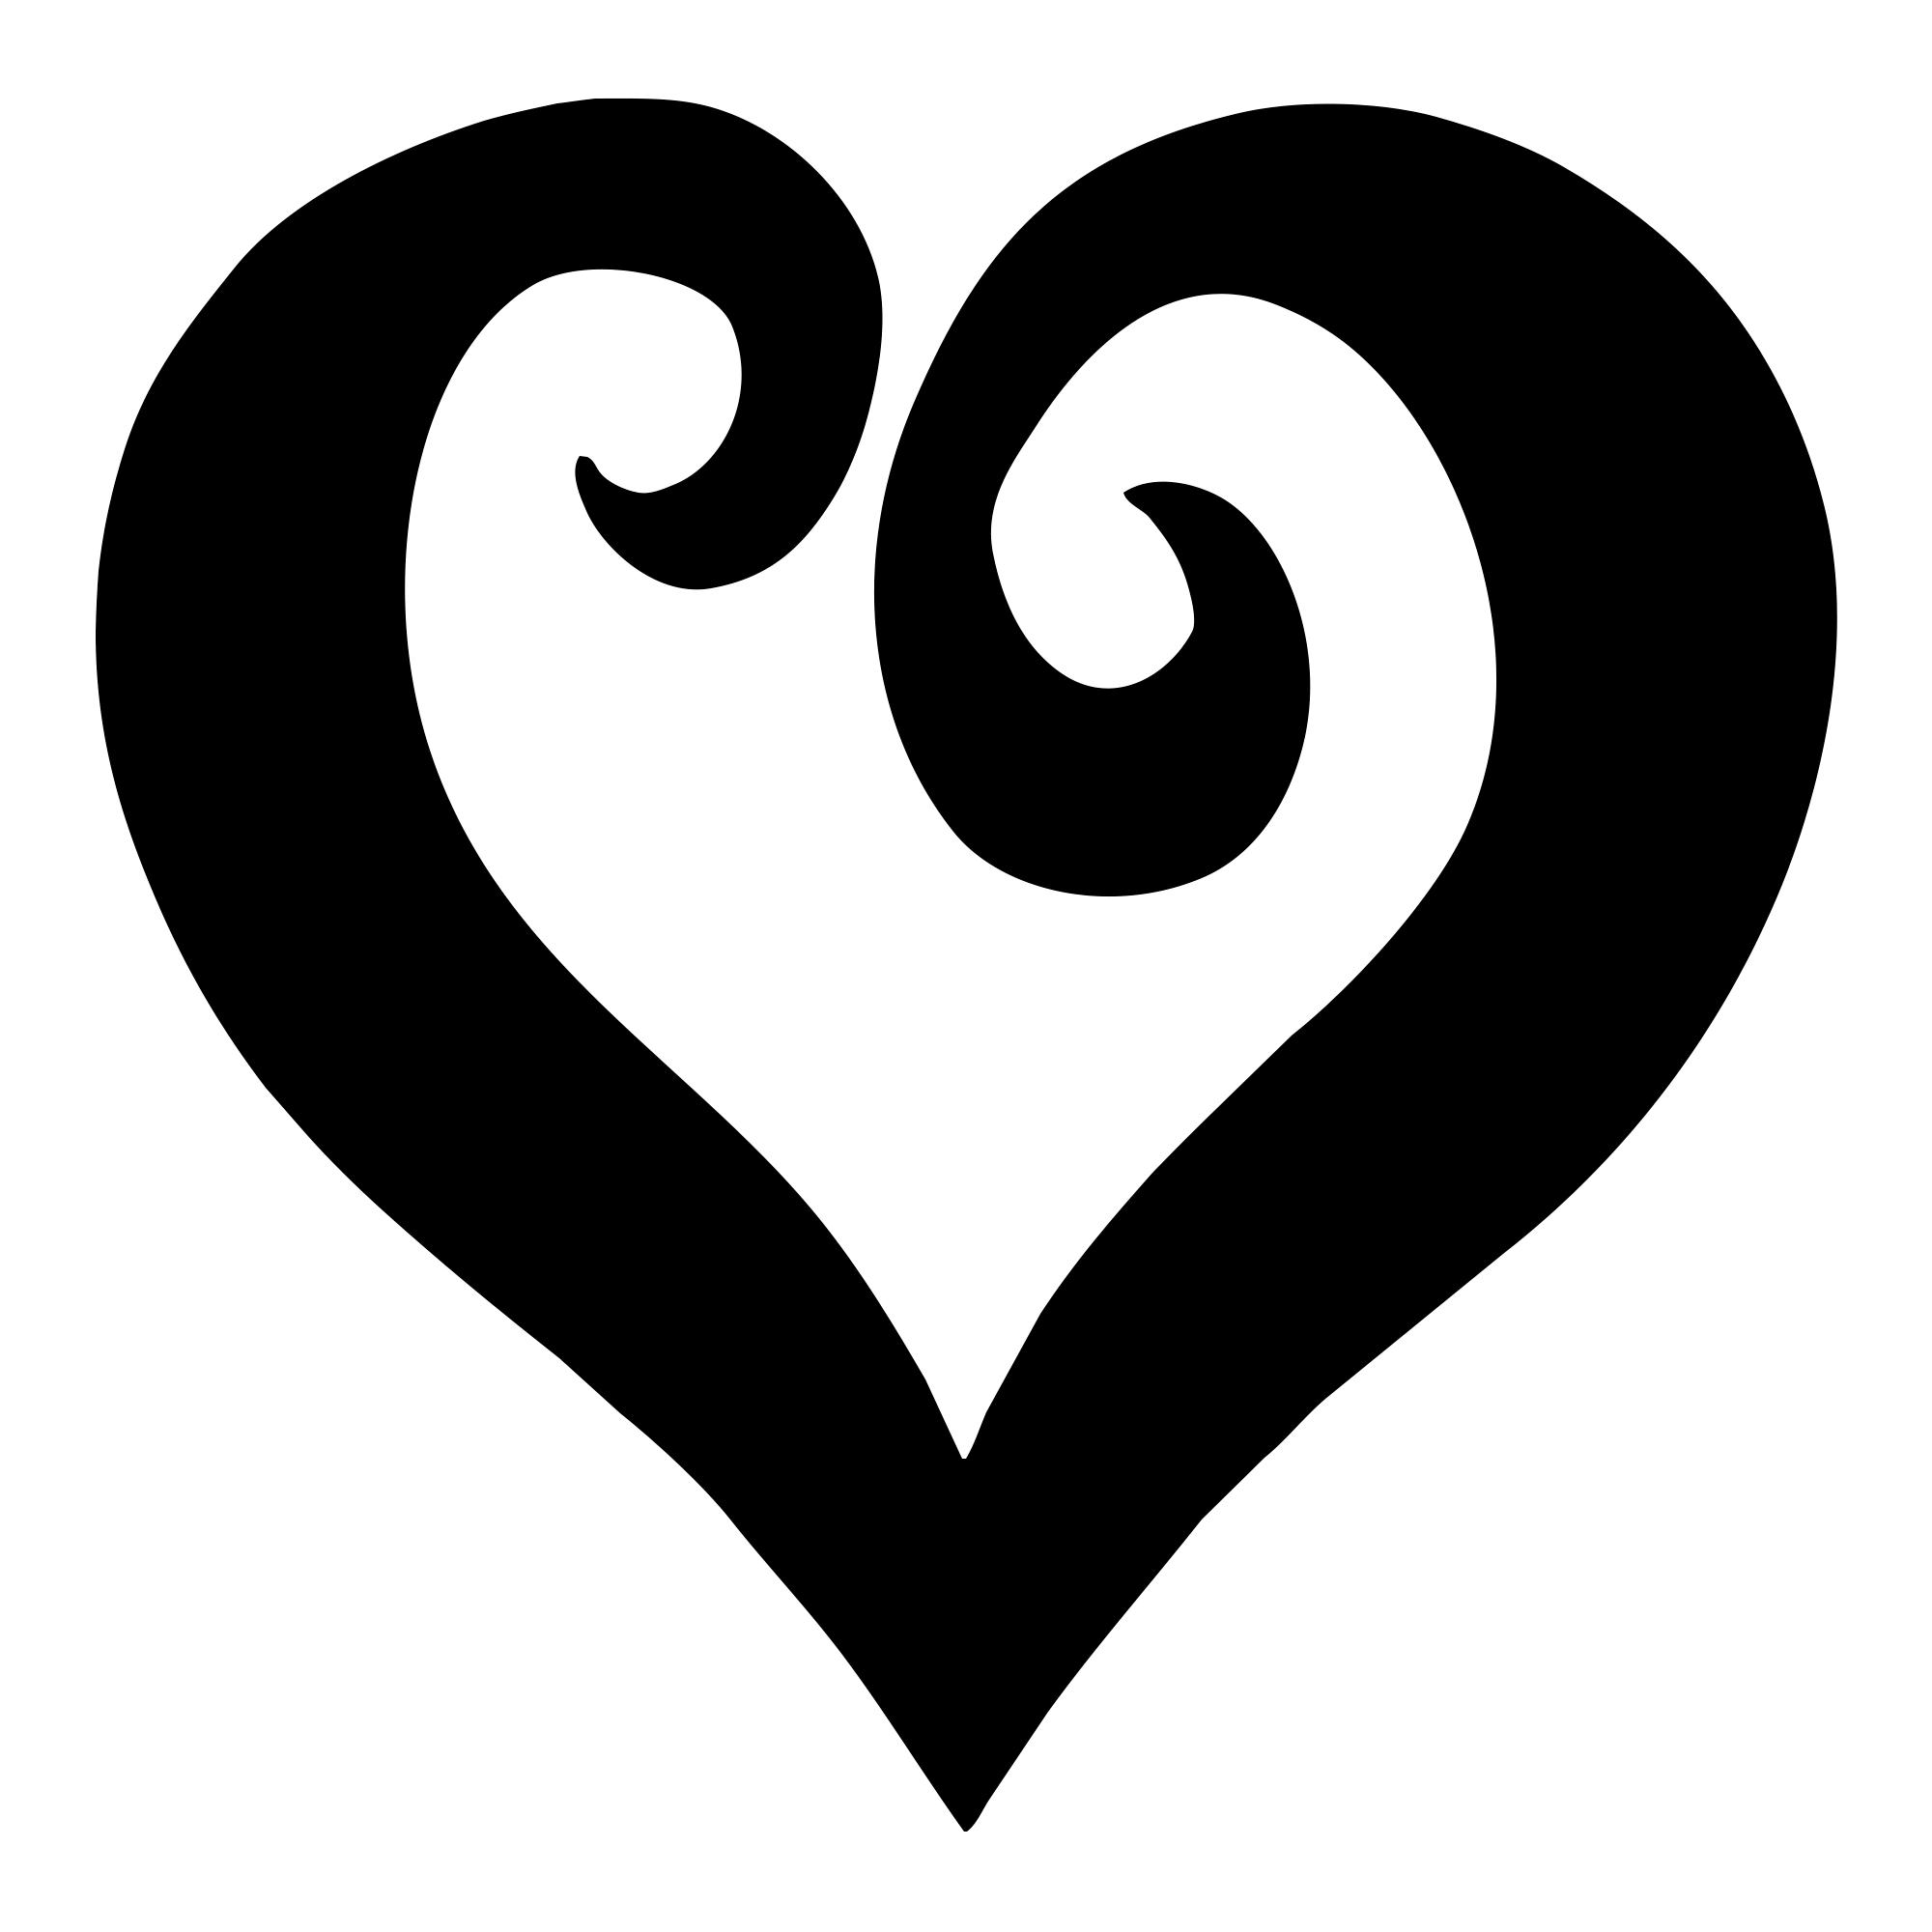 heart pictures black heart clip art at clkercom vector clip art online pictures heart